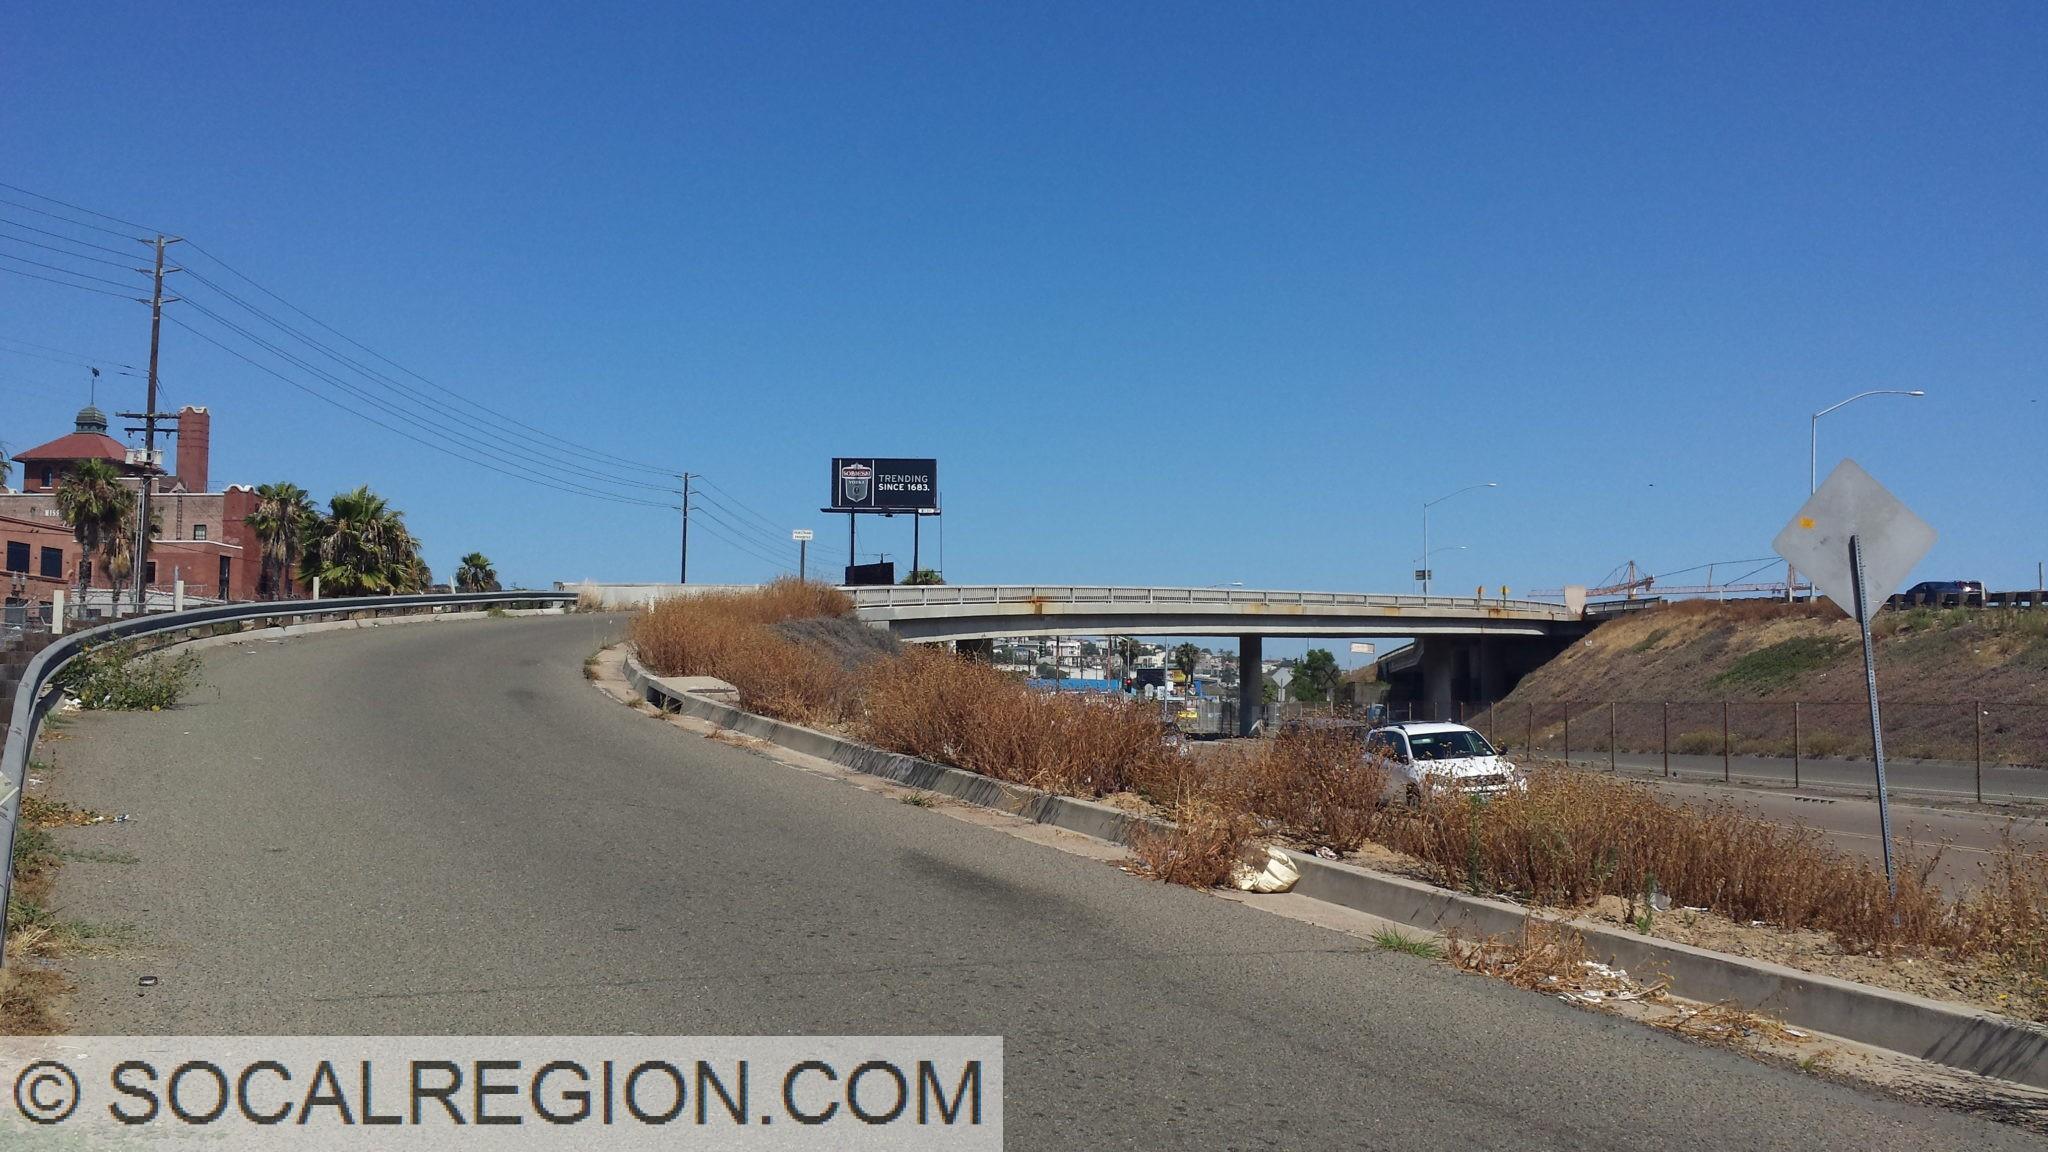 Pacific Highway in San Diego | Southern California Regional Rocks ...